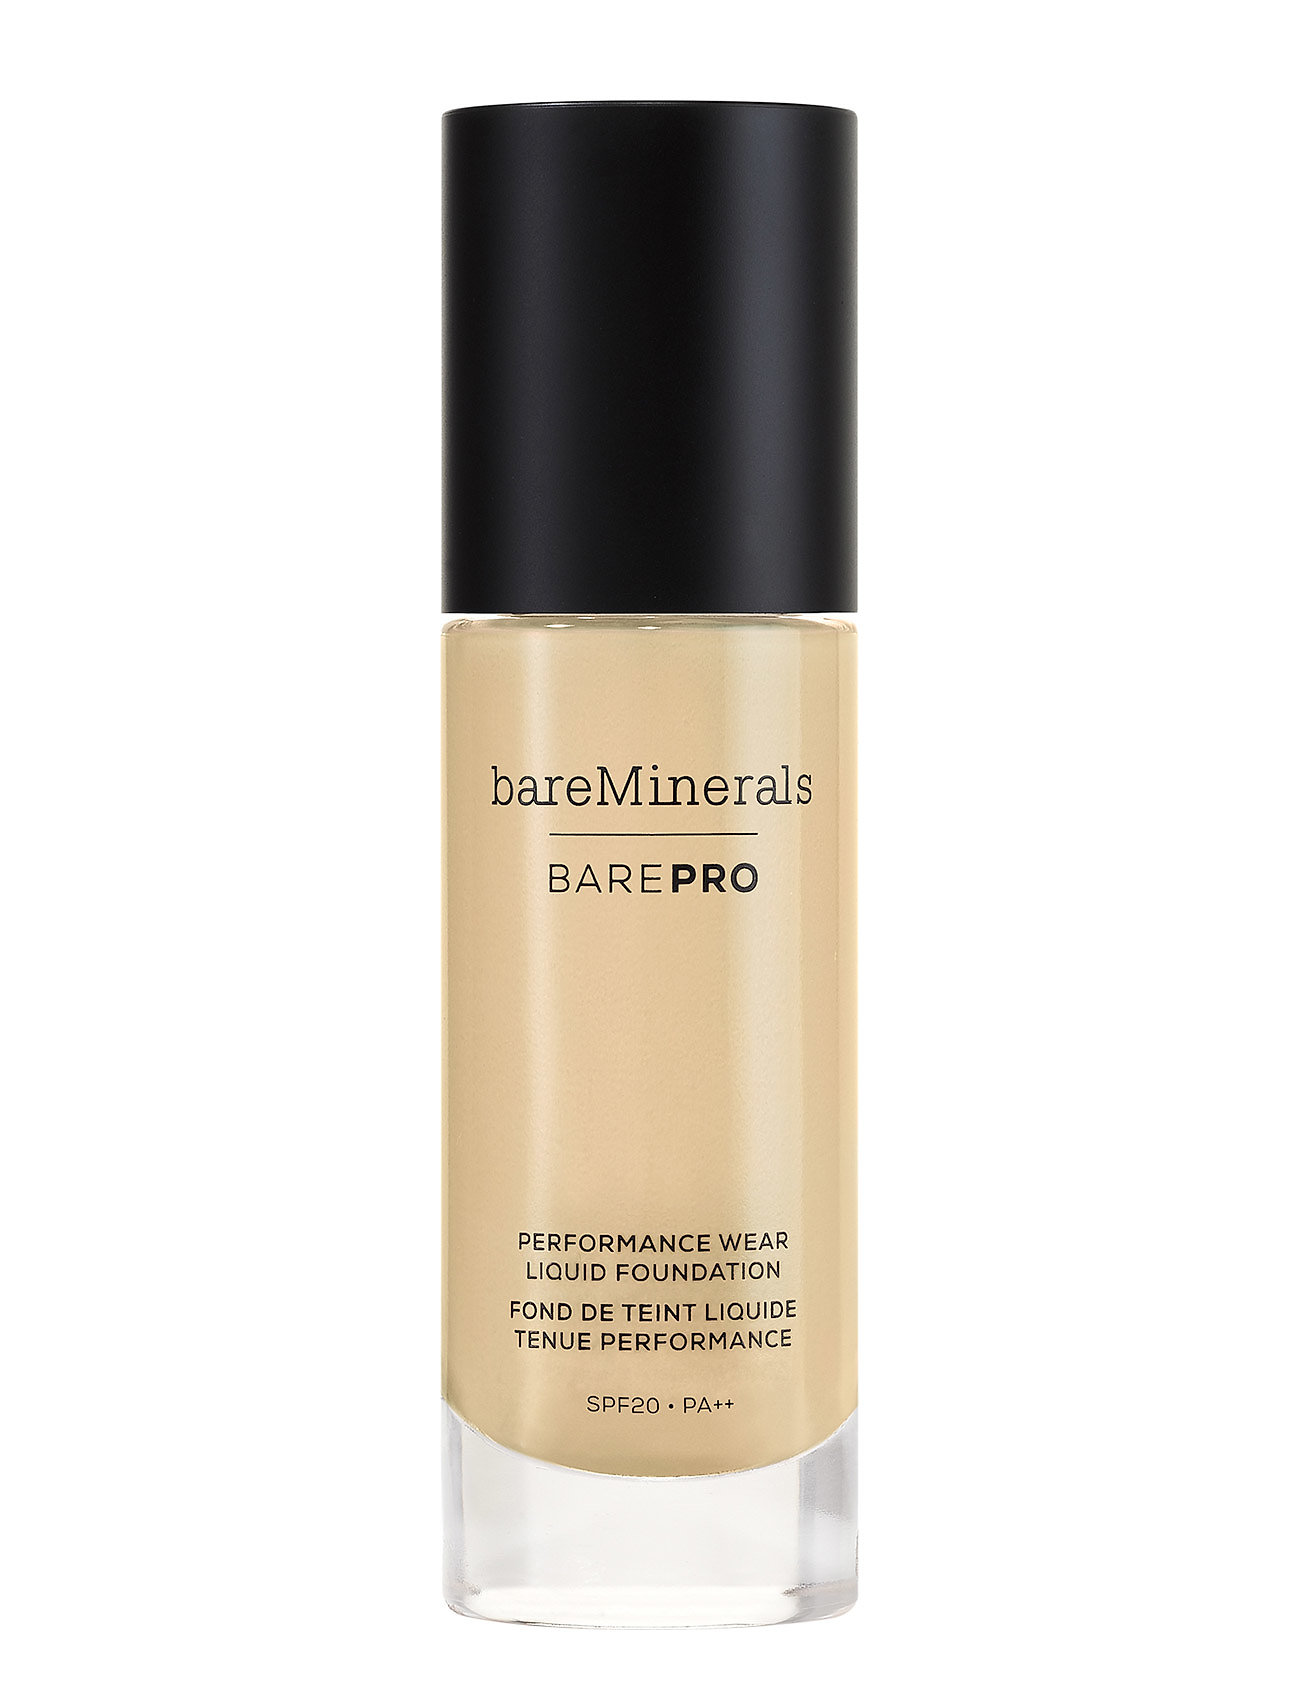 Image of Barepro Performance Wear Liquid Foundation Spf 20 Foundation Makeup BareMinerals (3067521573)